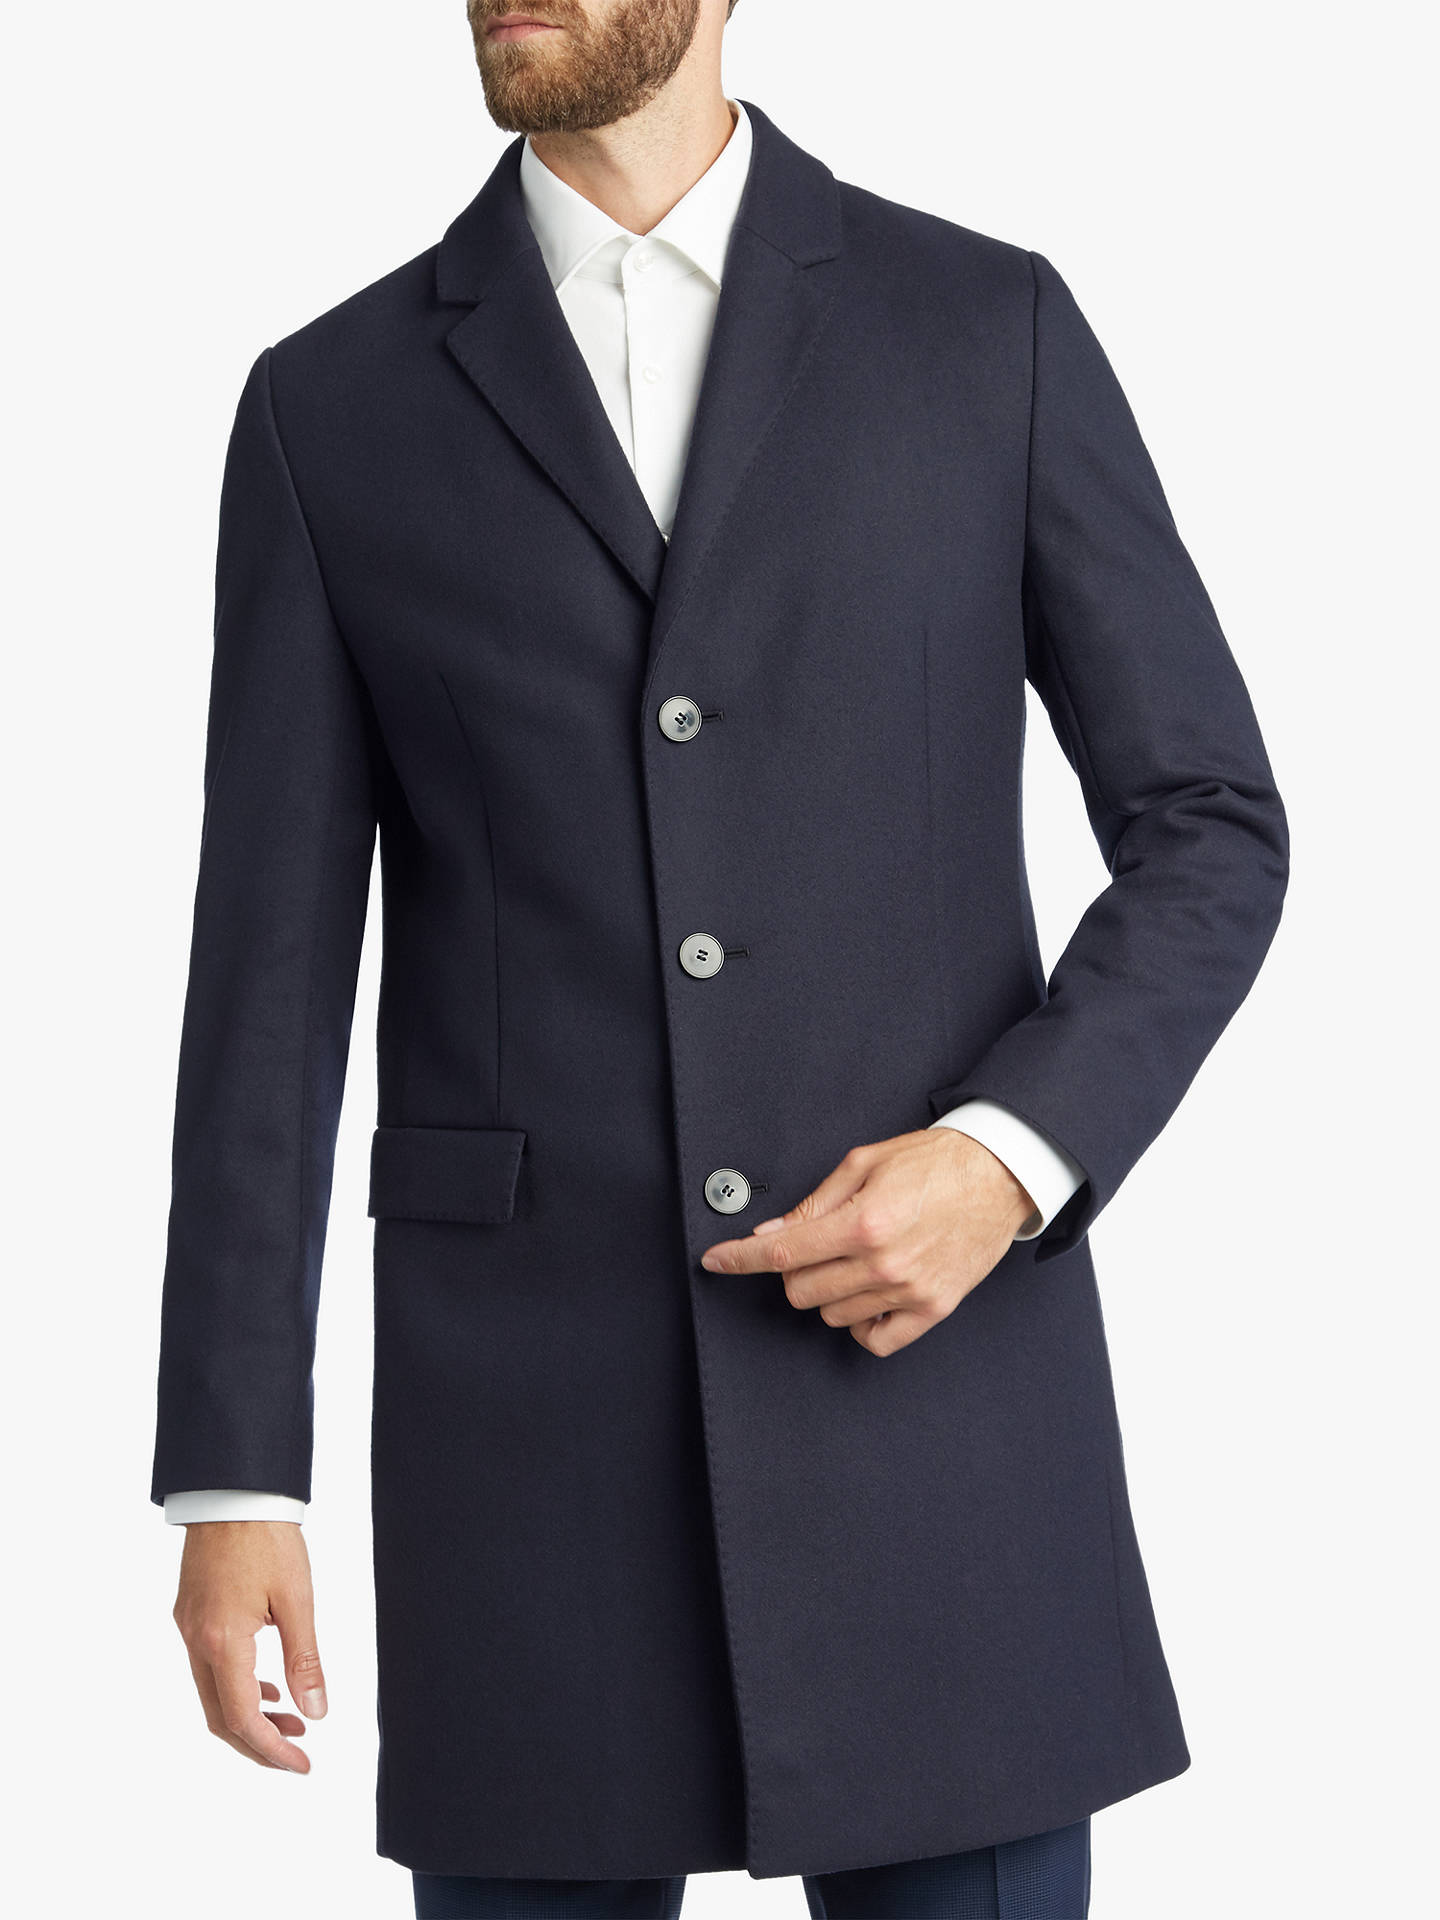 71ba51aa986 HUGO by Hugo Boss Migor1841 Slim Fit Overcoat at John Lewis & Partners